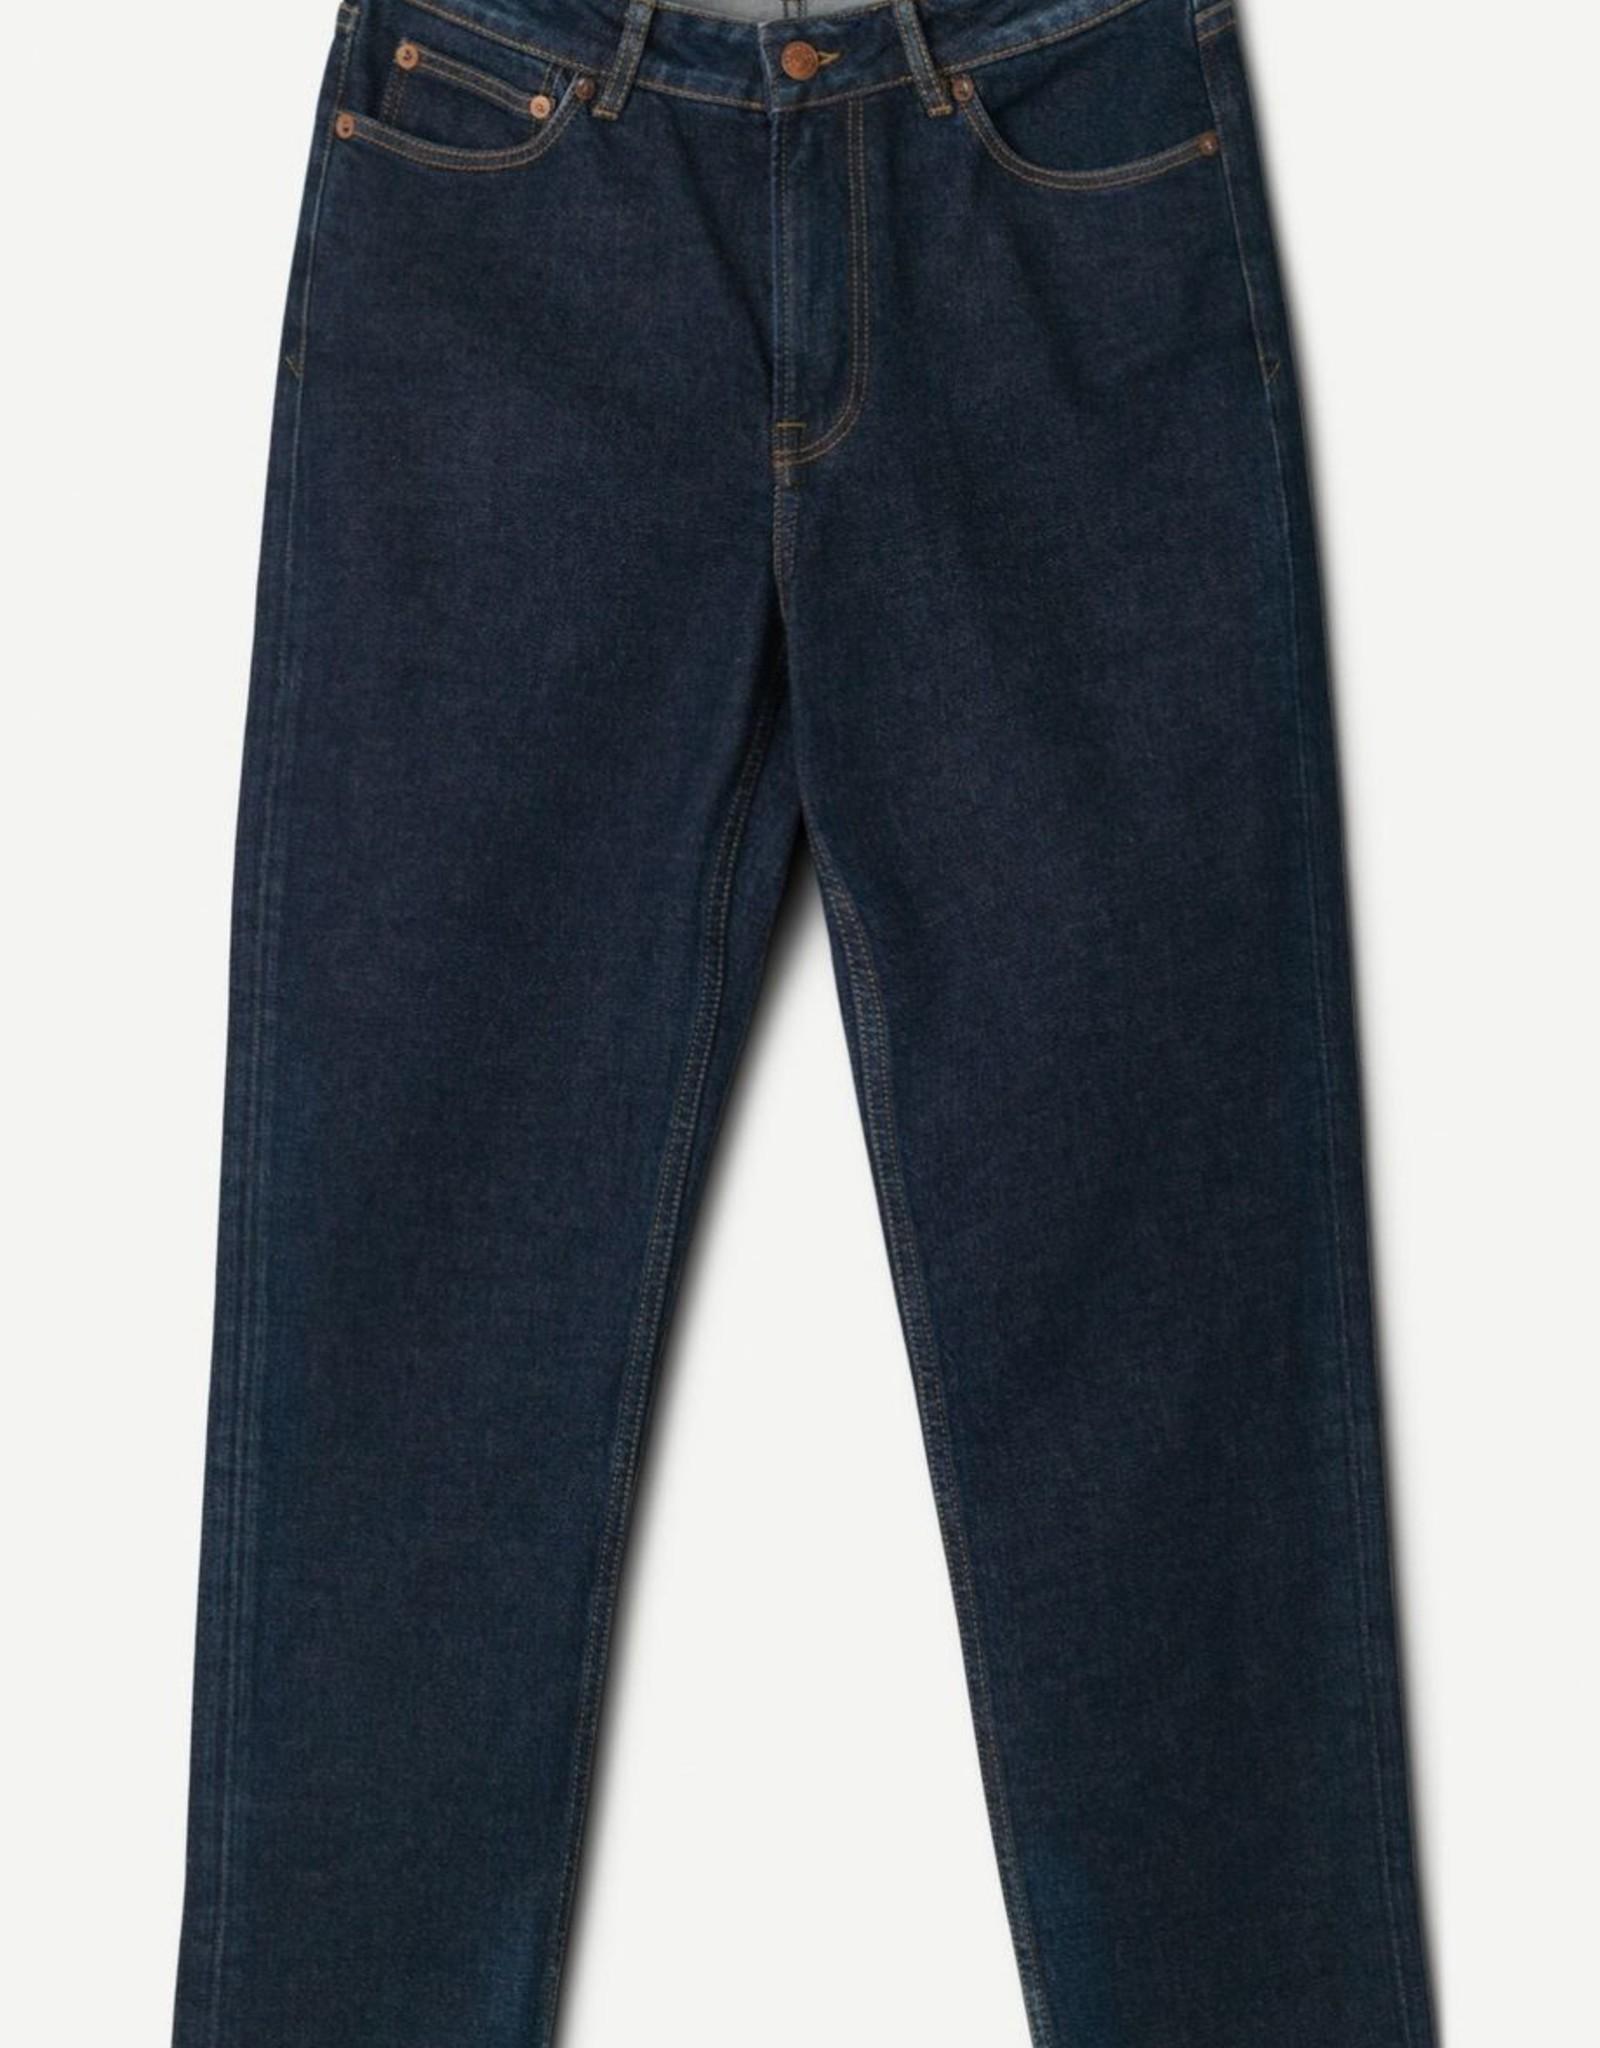 Samsoe Samsoe Marianne jeans 13026 AUTHENTIC